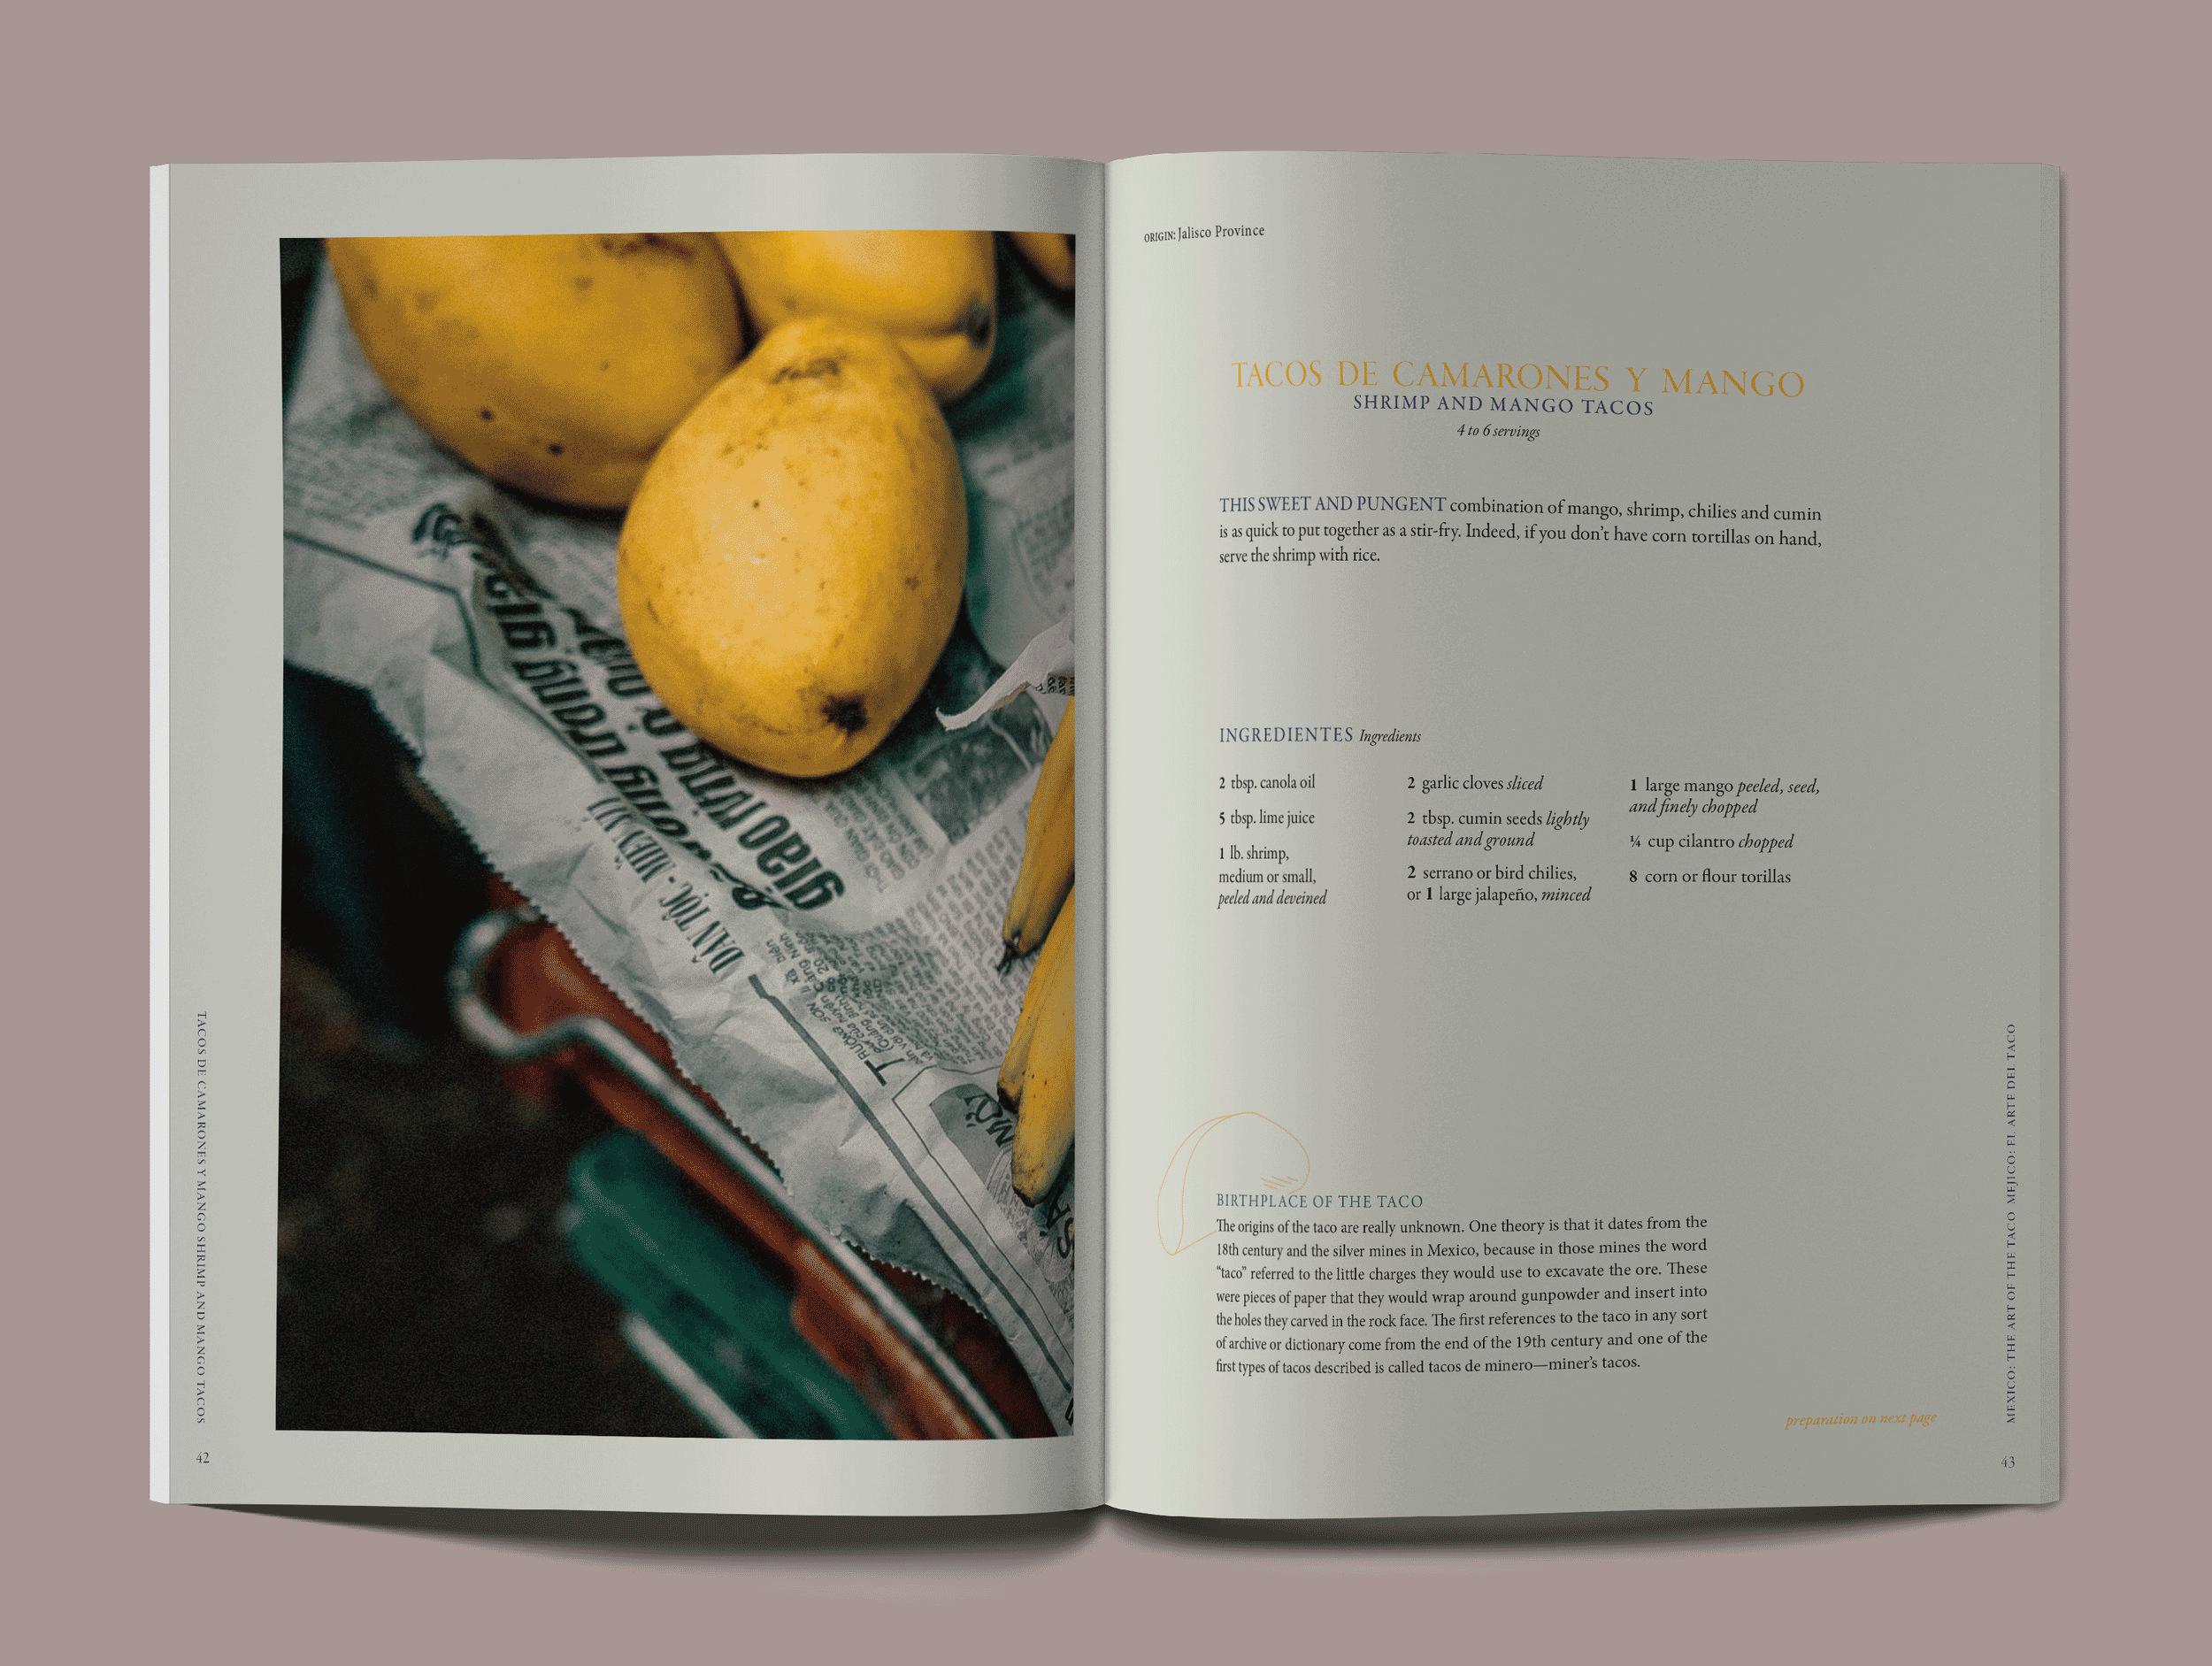 recipe1.1.png